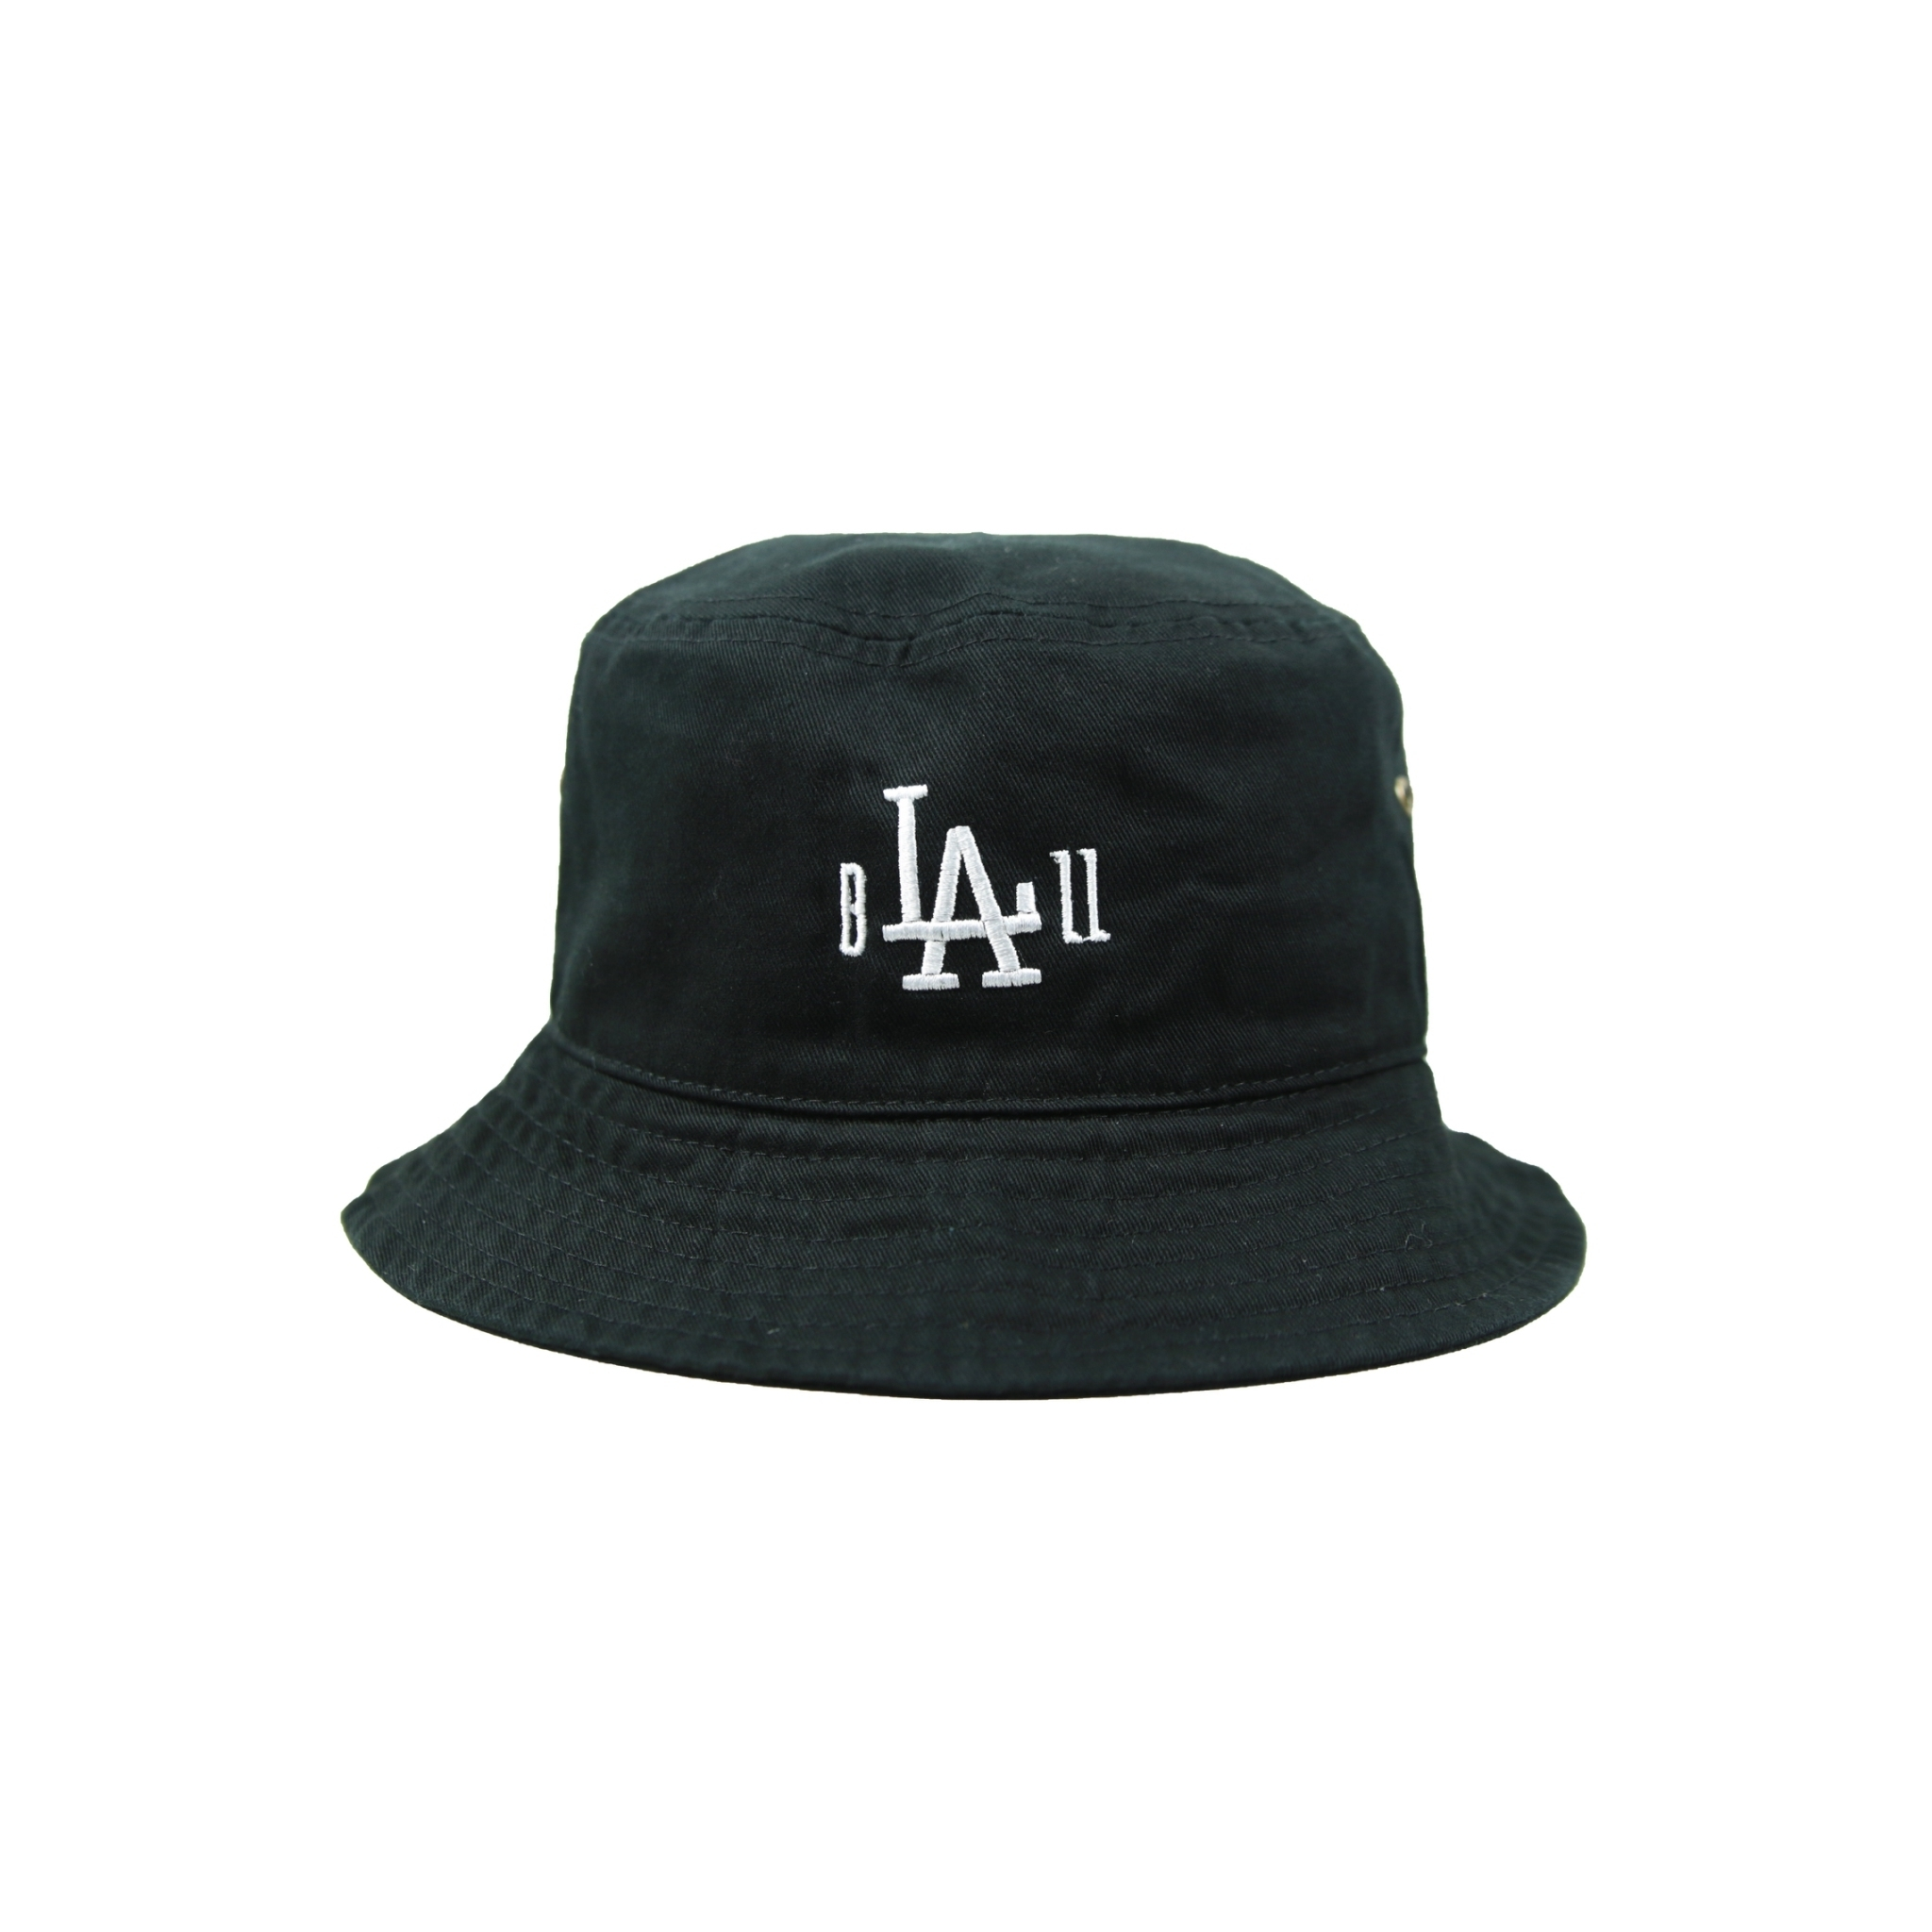 b'LA'ZZ BUCKET HAT [BLACK]